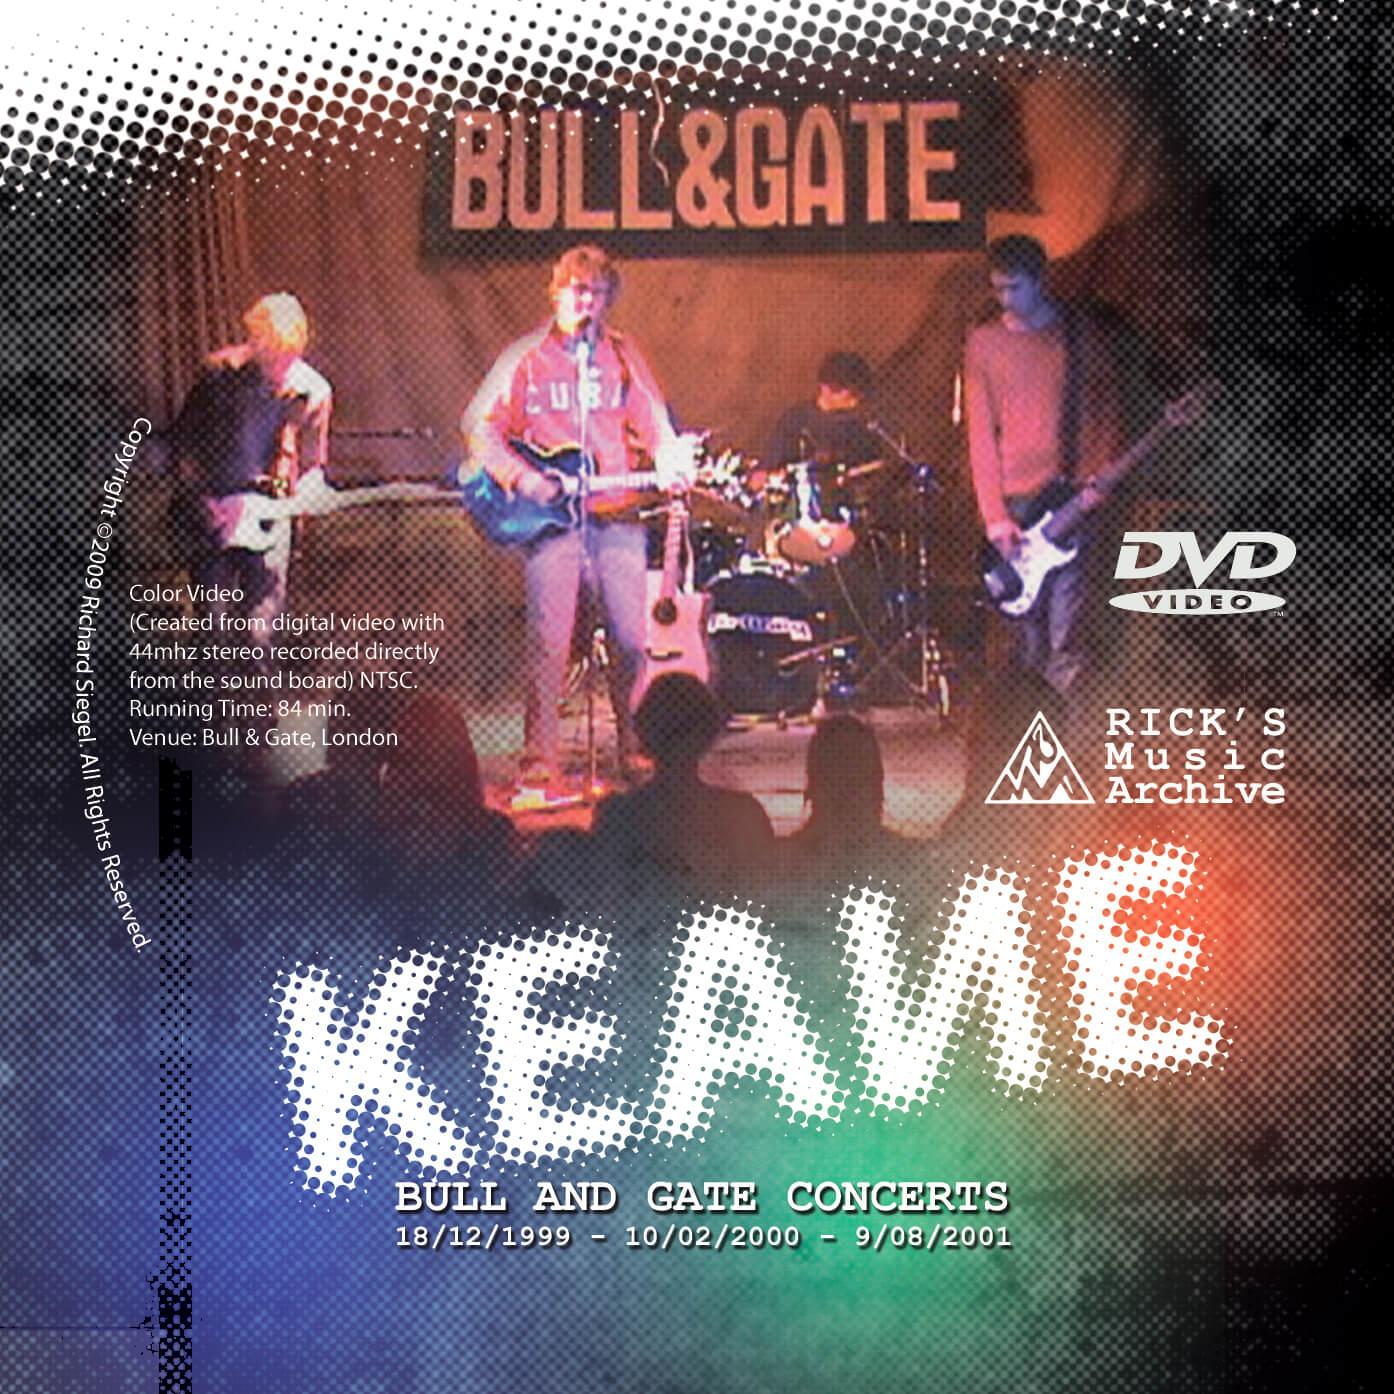 Keane Live 3 Concert DVD